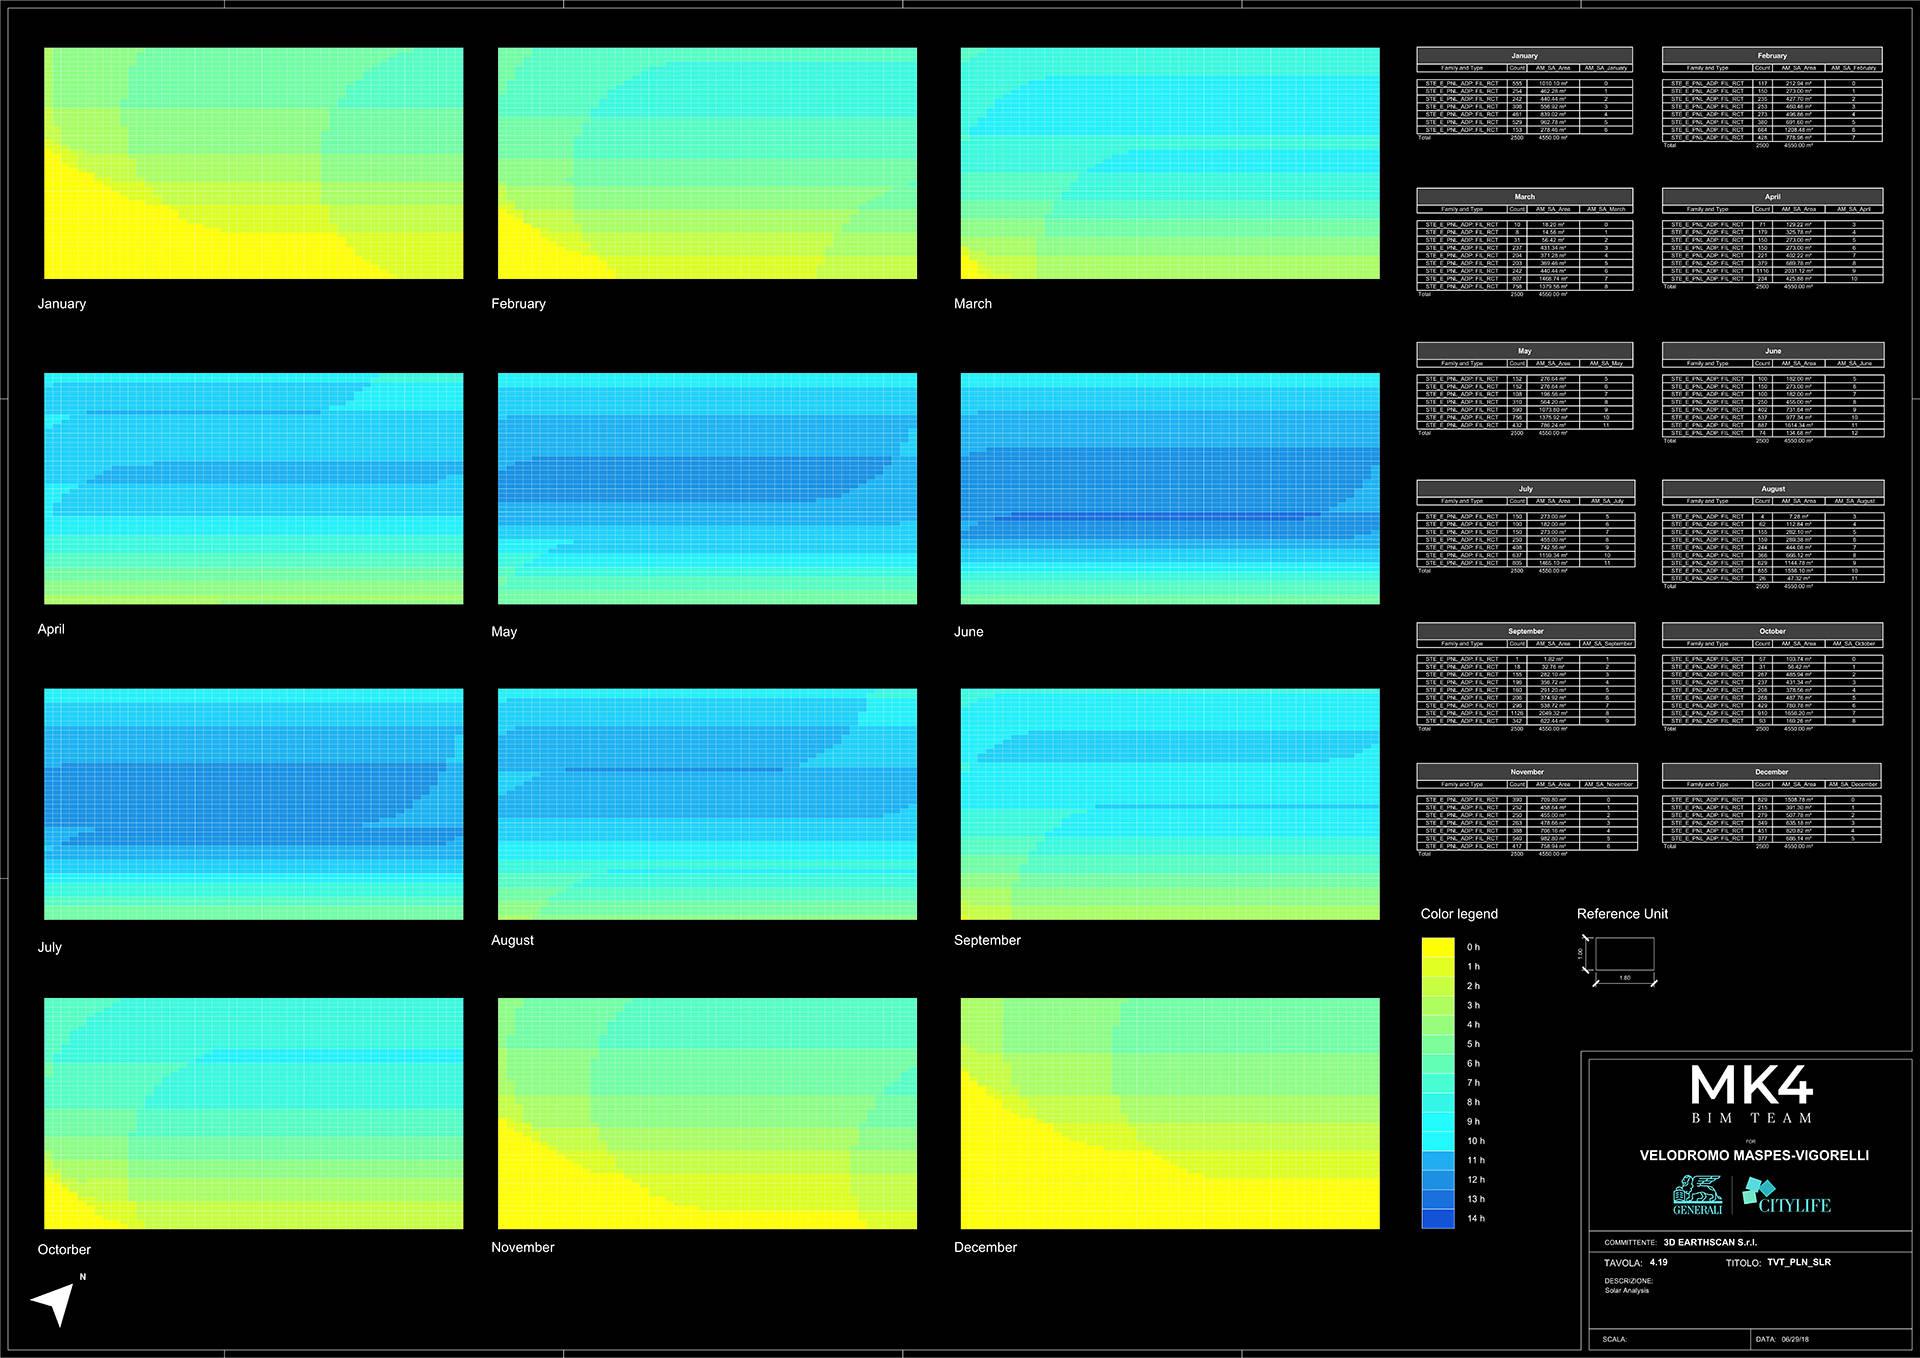 Data analysis con Dynamo